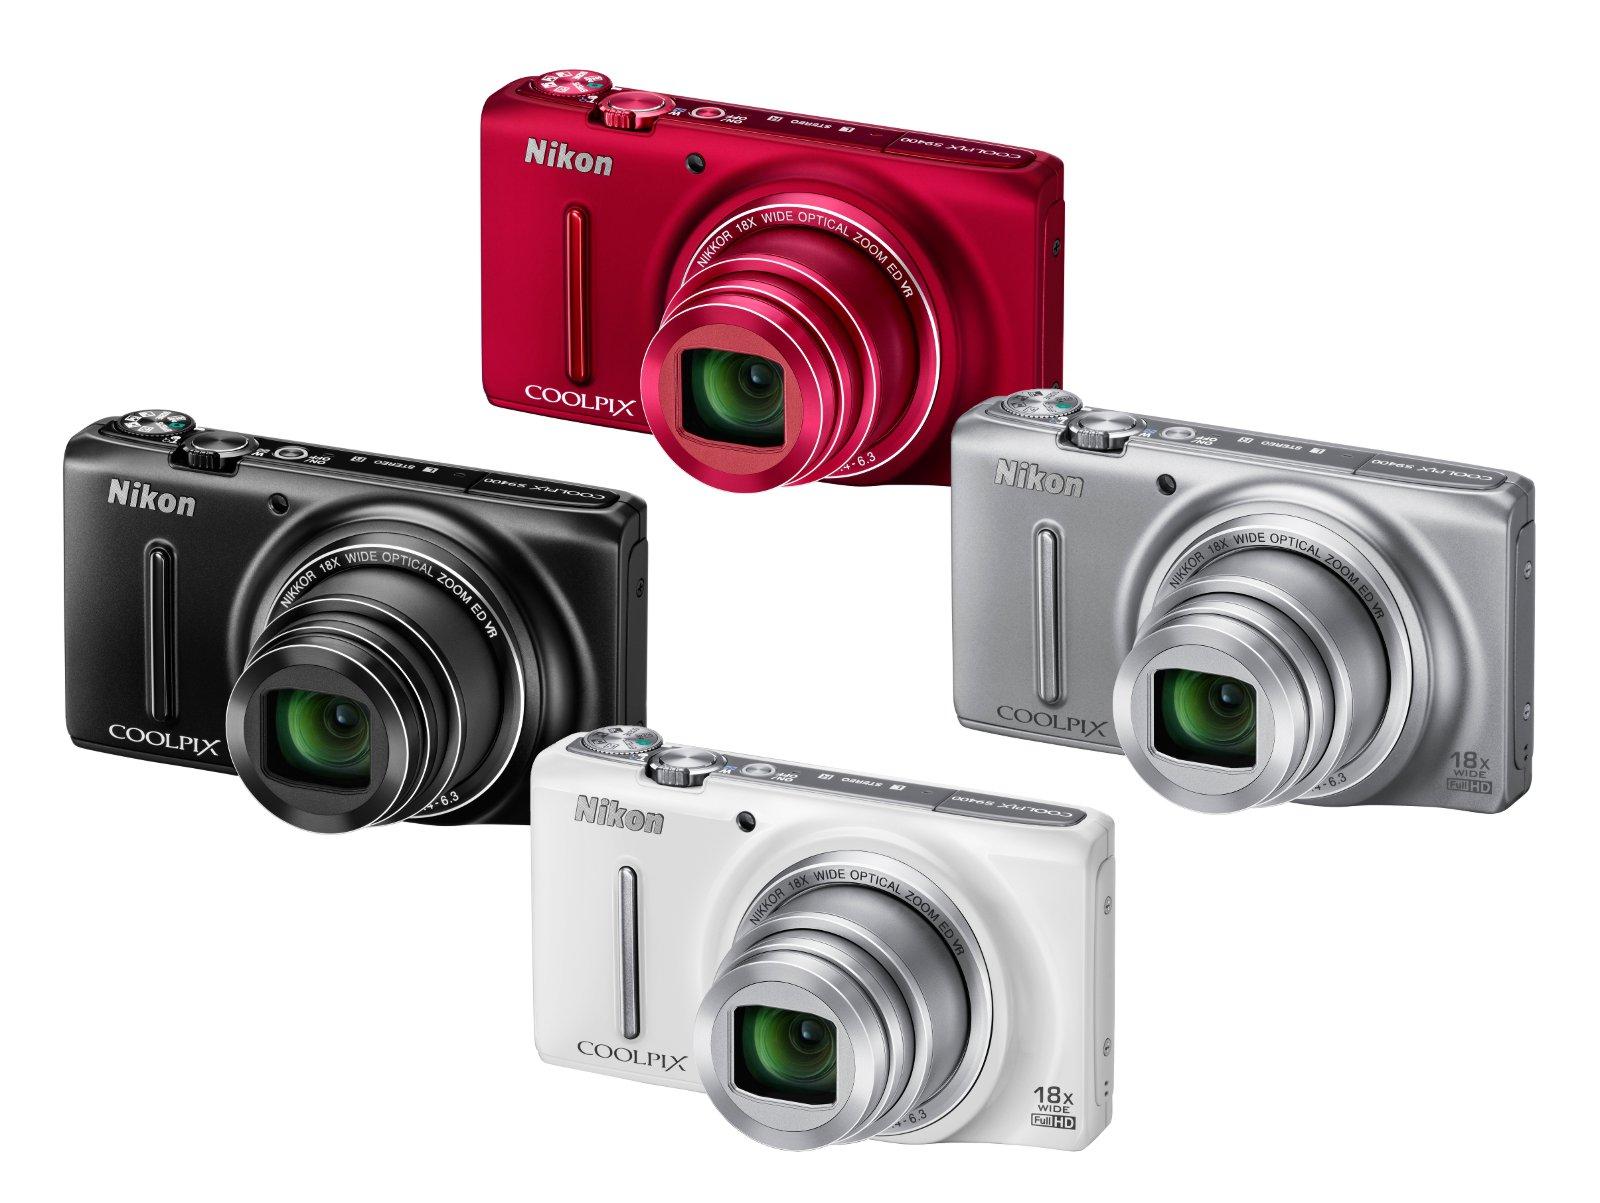 Nikon Coolpix S9400 Camera - Silver 3.0 inch OLED: Amazon.co.uk ...